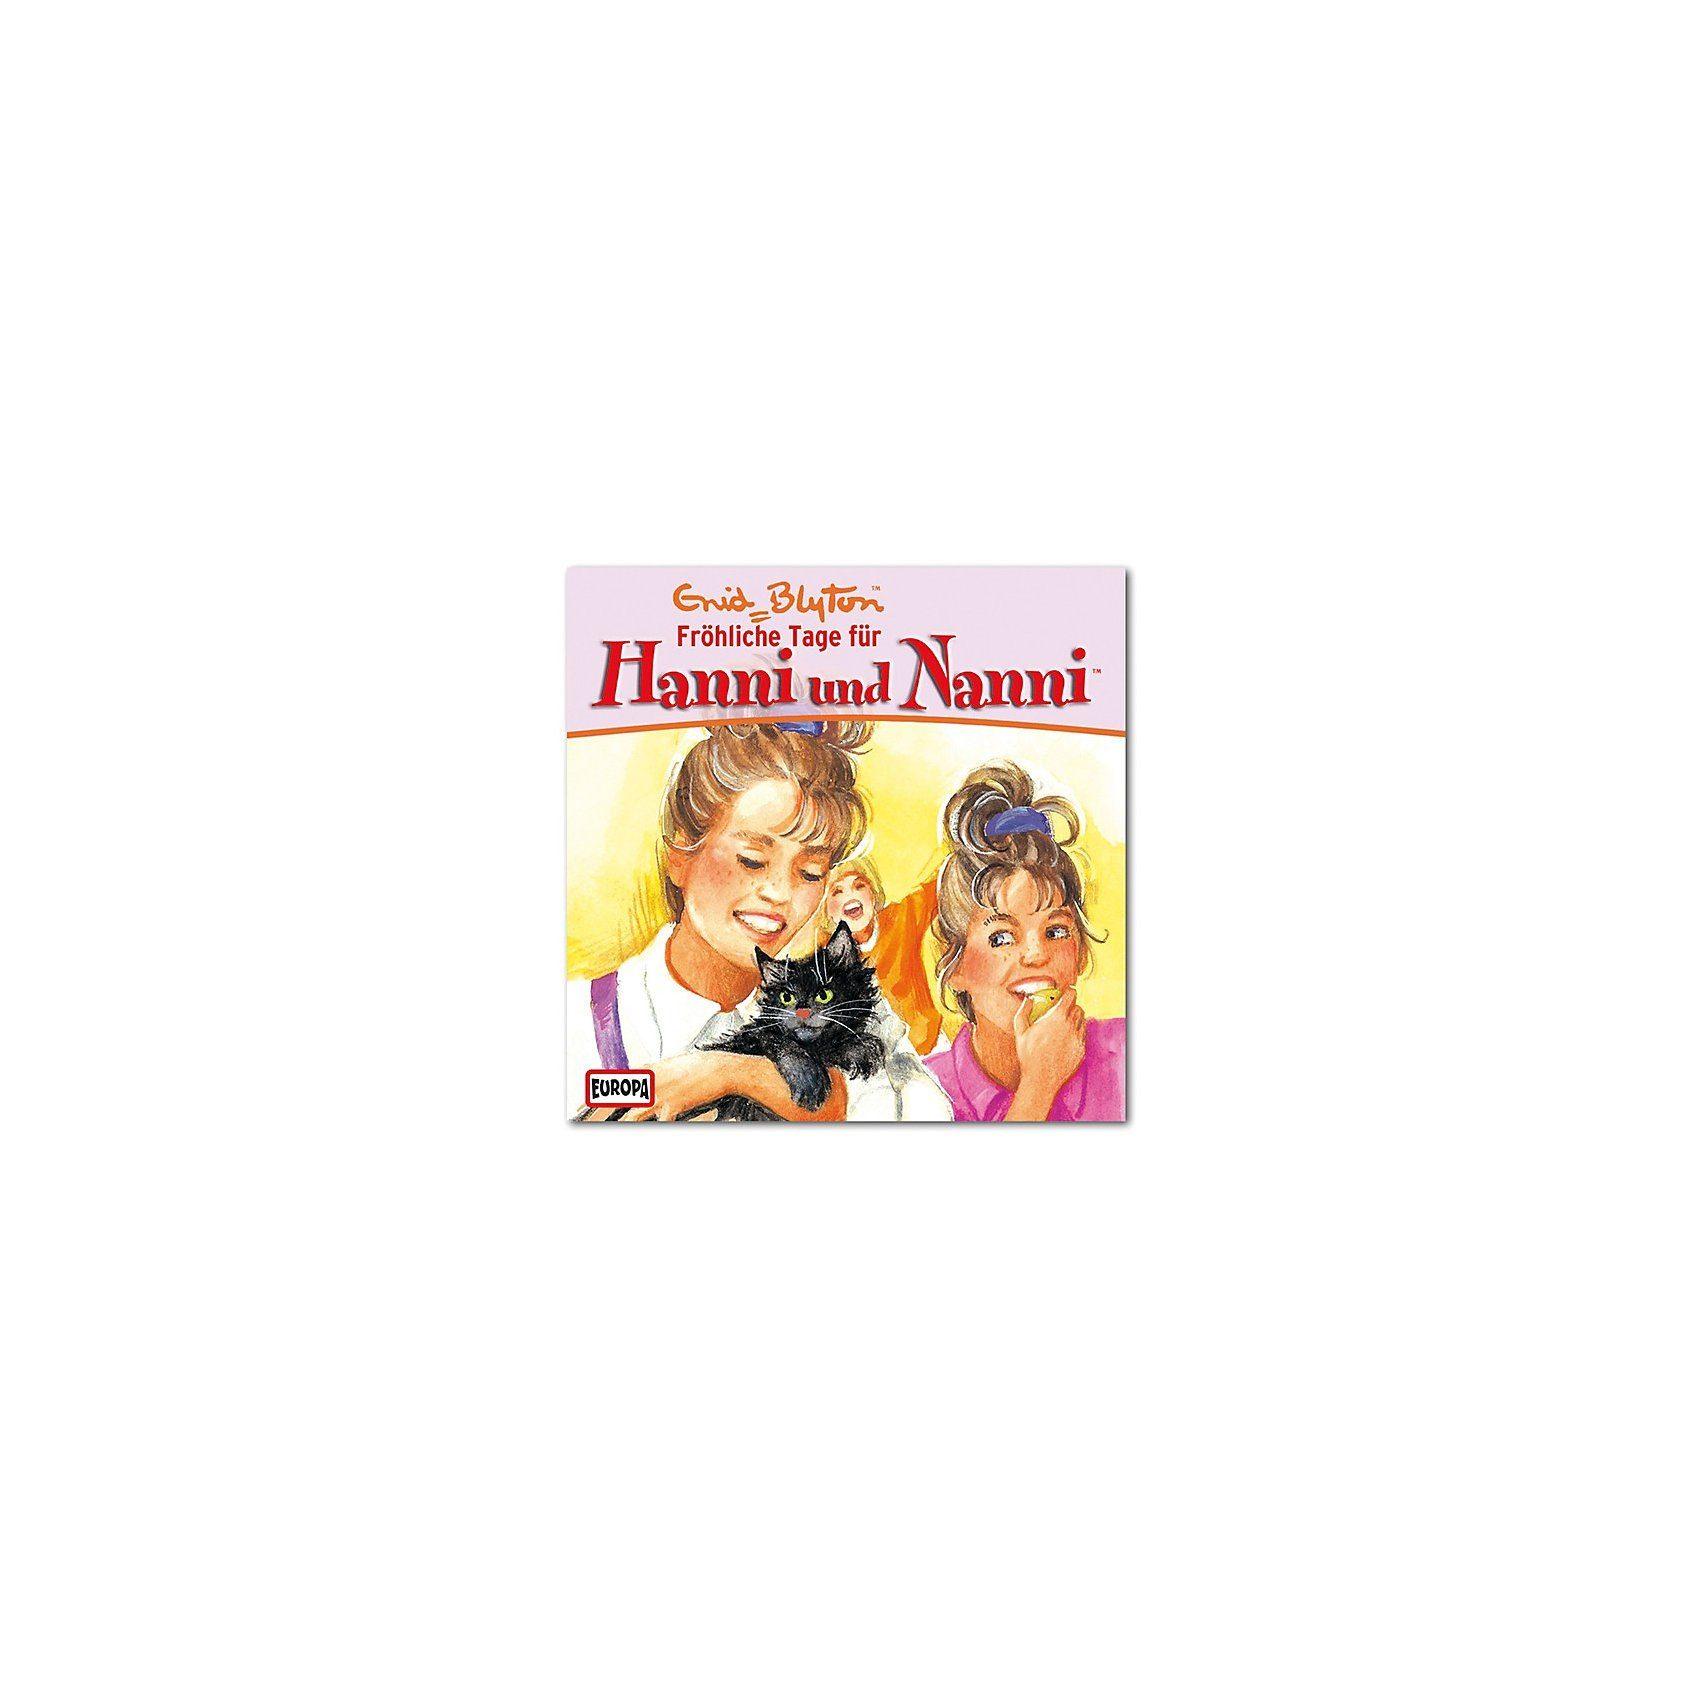 Sony CD Hanni & Nanni 08 - Fröhliche Tage für Hanni und Nanni